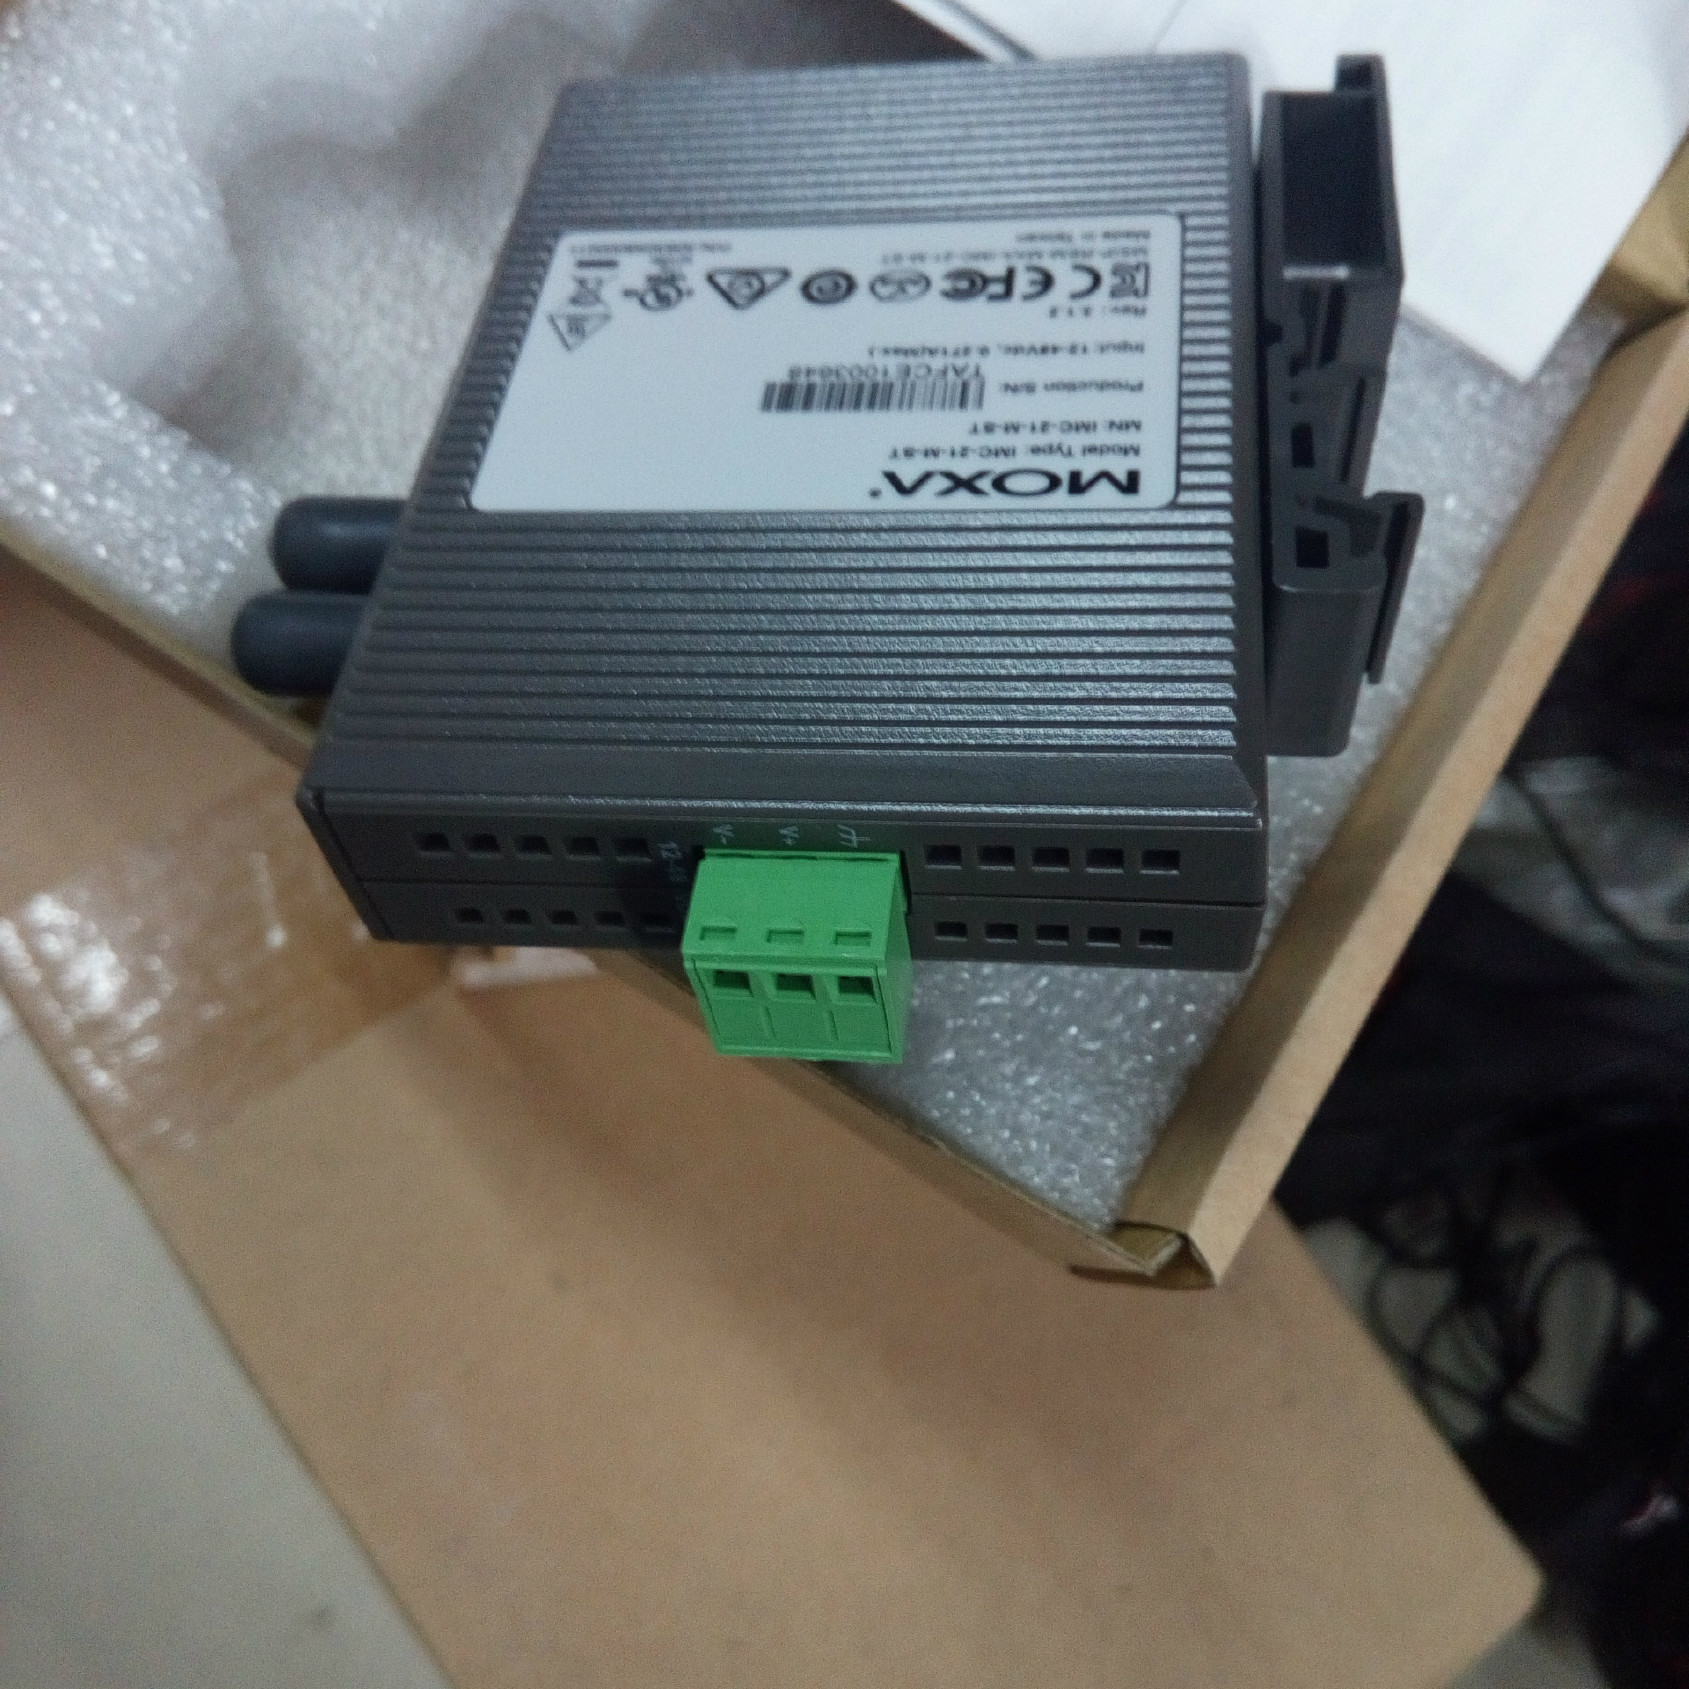 moxa 工业级光收发器100M接口st sc 型号ma21示例图4